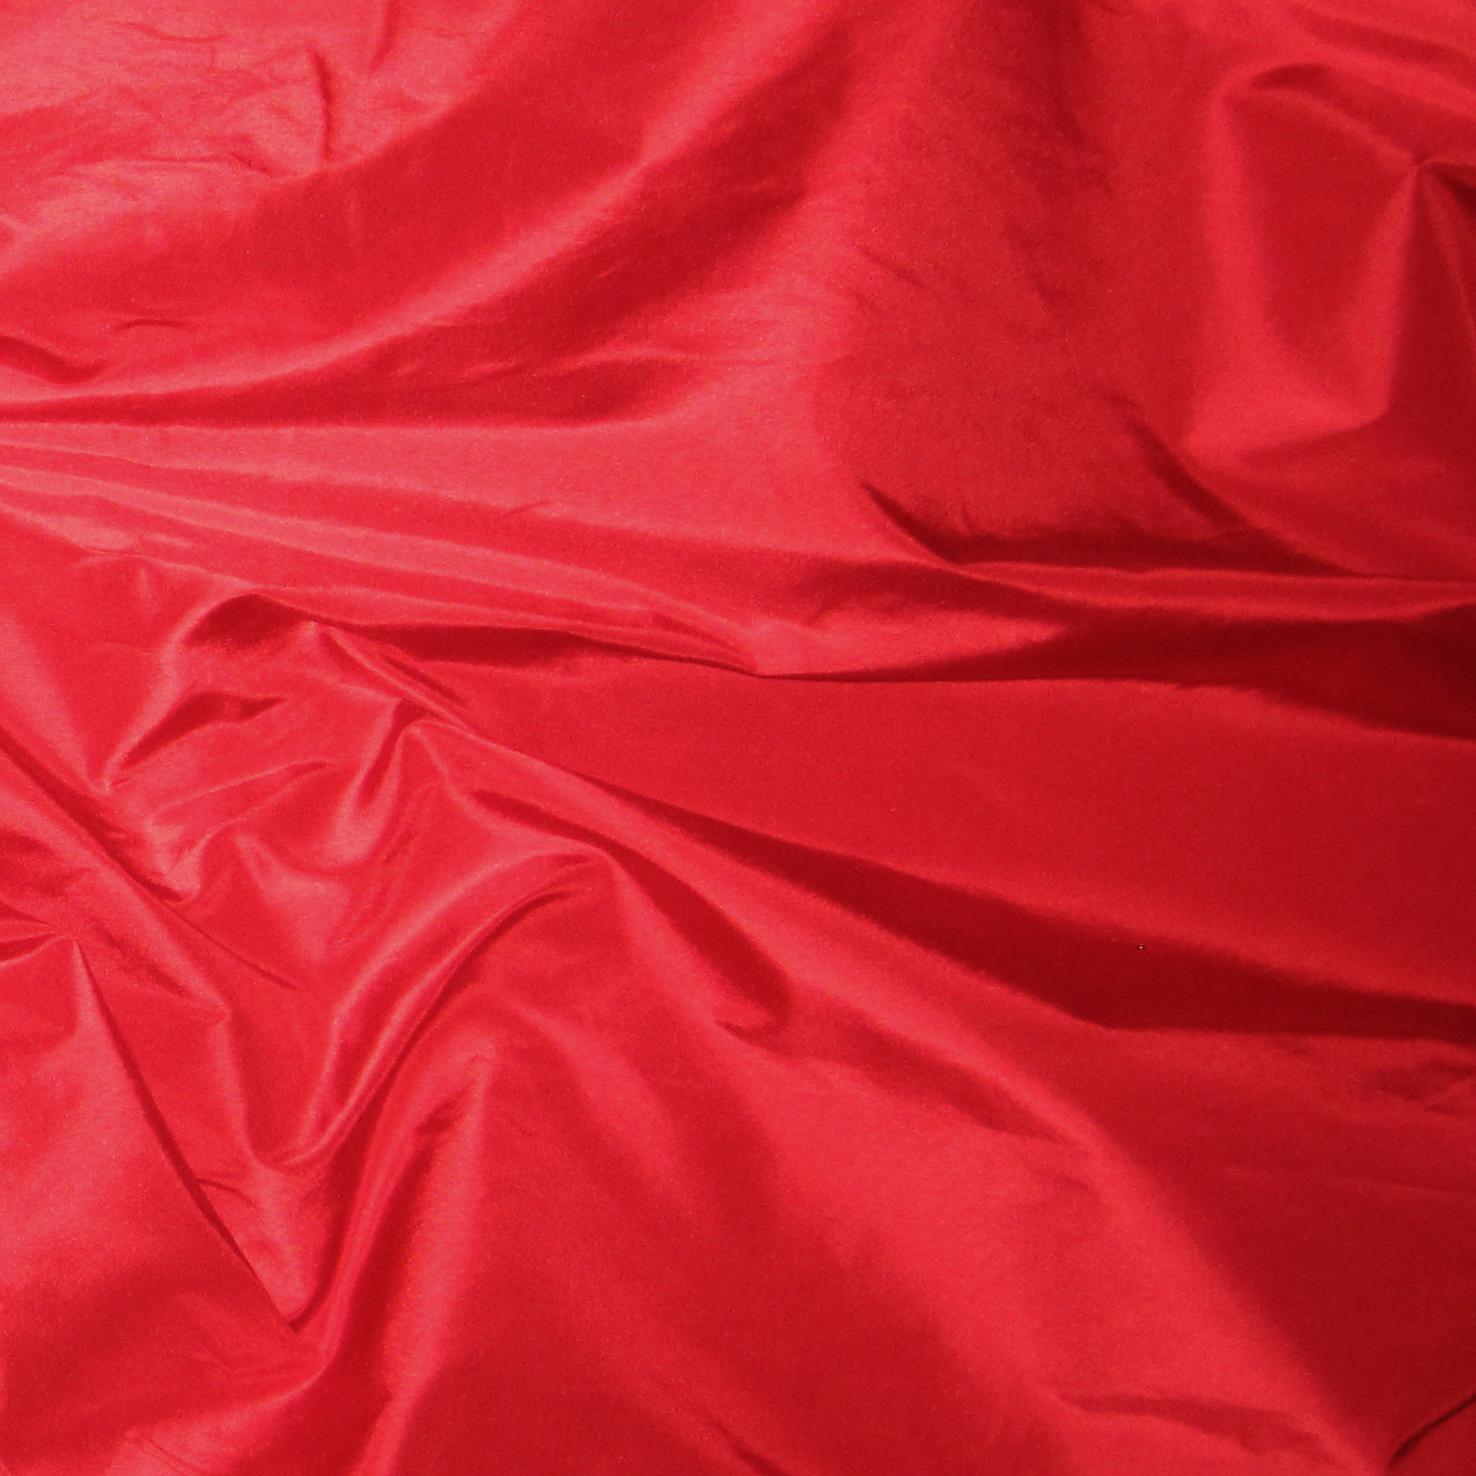 Crimson Silk Taffeta - Renaissance Fabrics